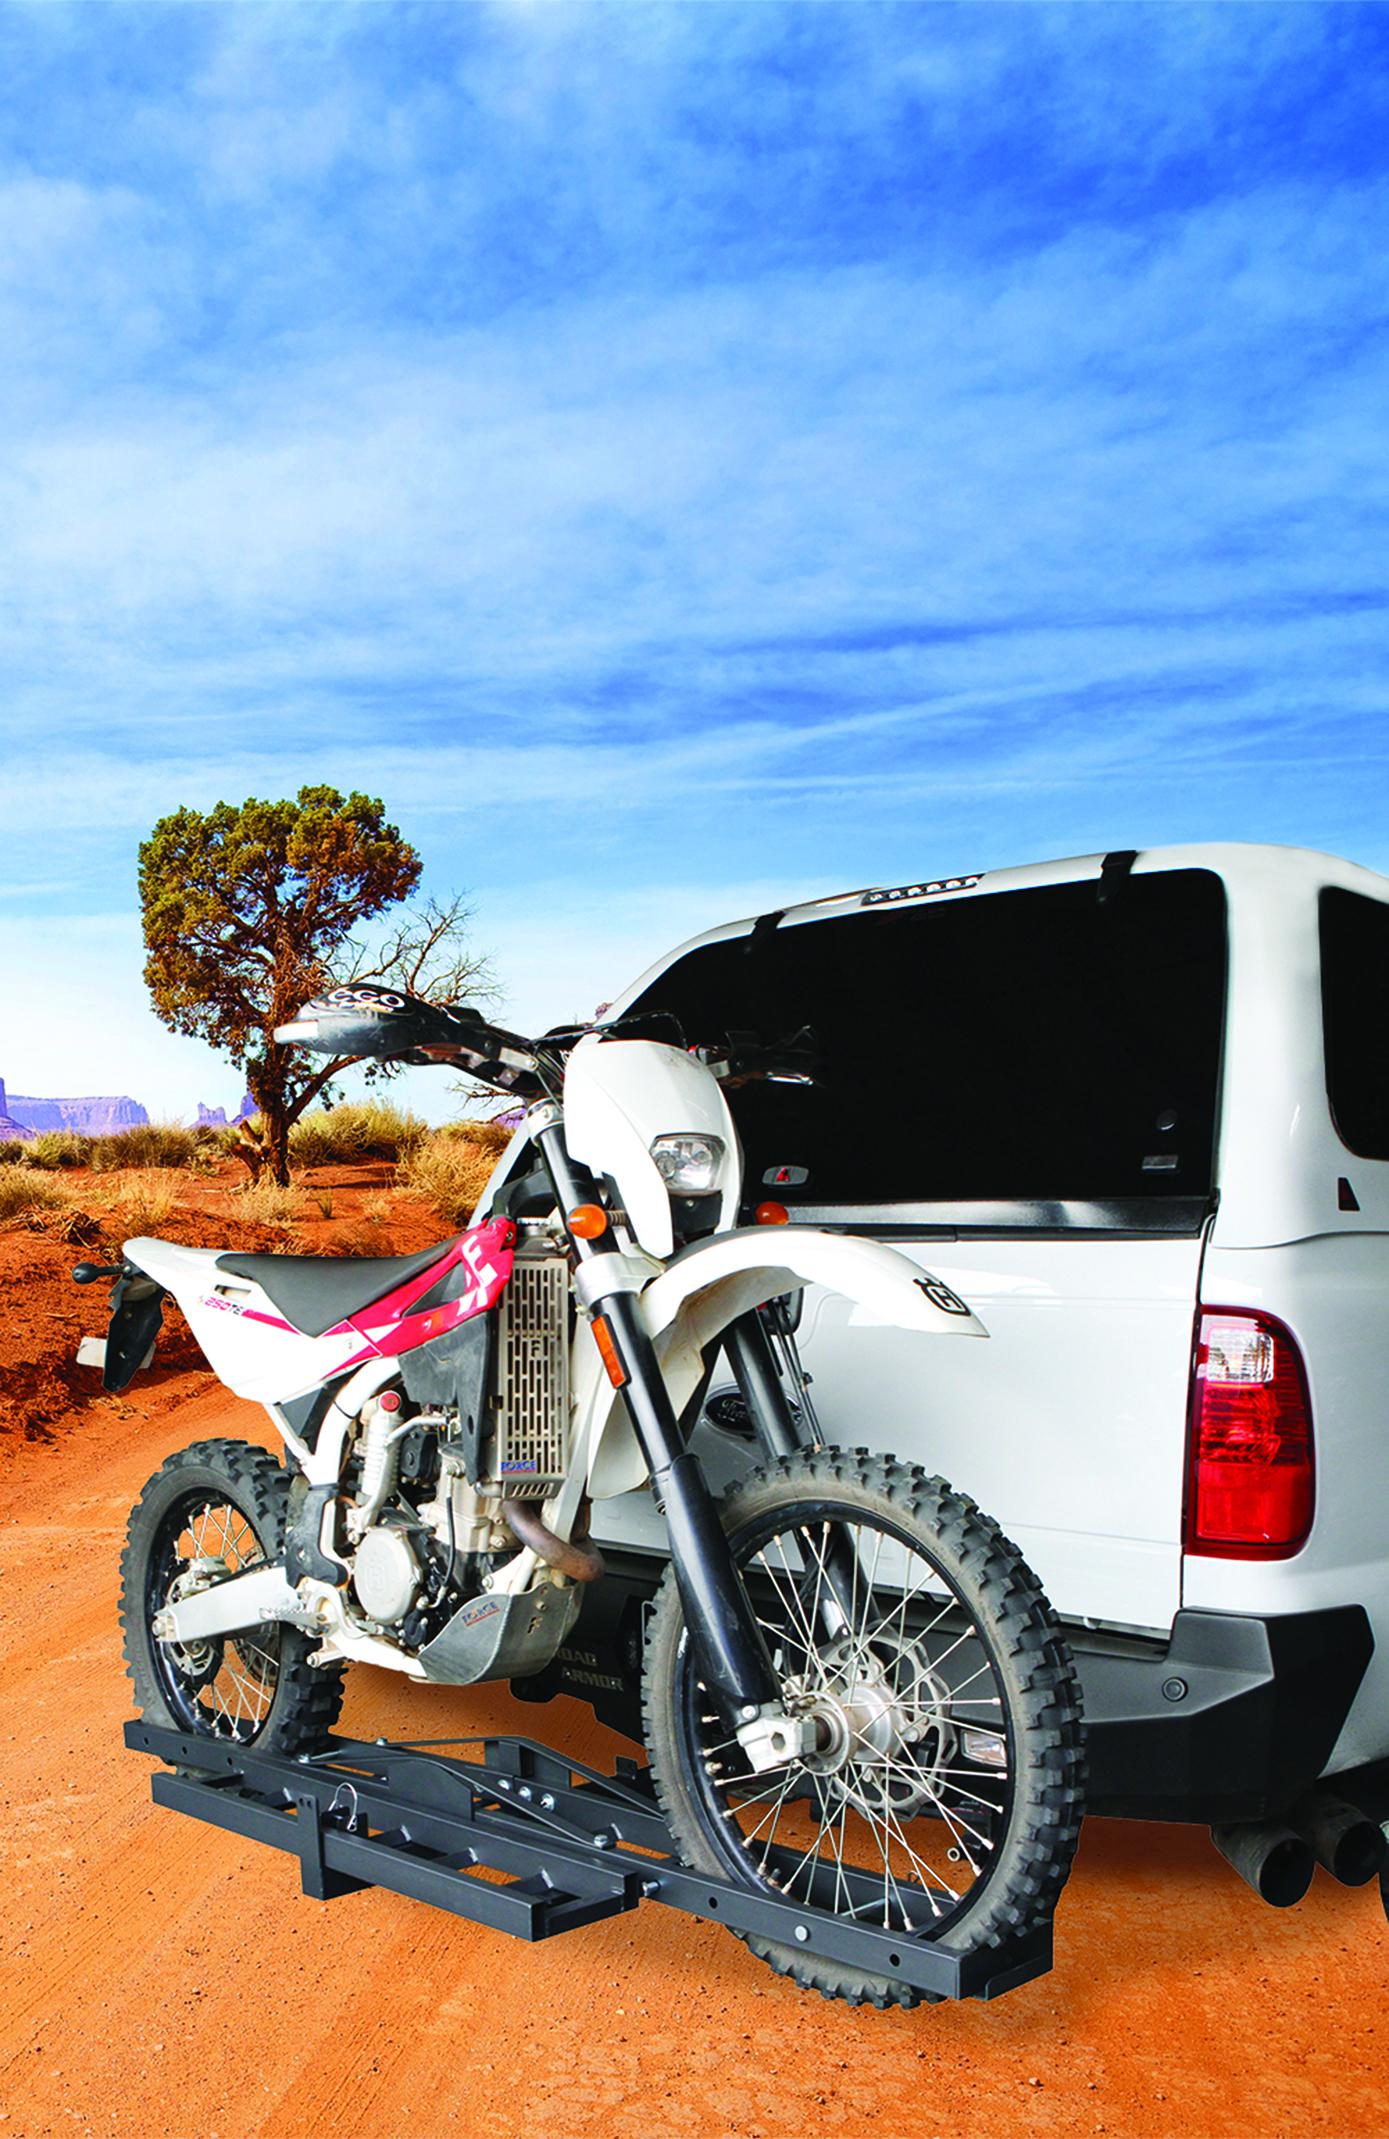 Dirt Bike Ramp >> Dirt Bike and Motor Bike Carrier Rack   GETAWAY OUTDOORS